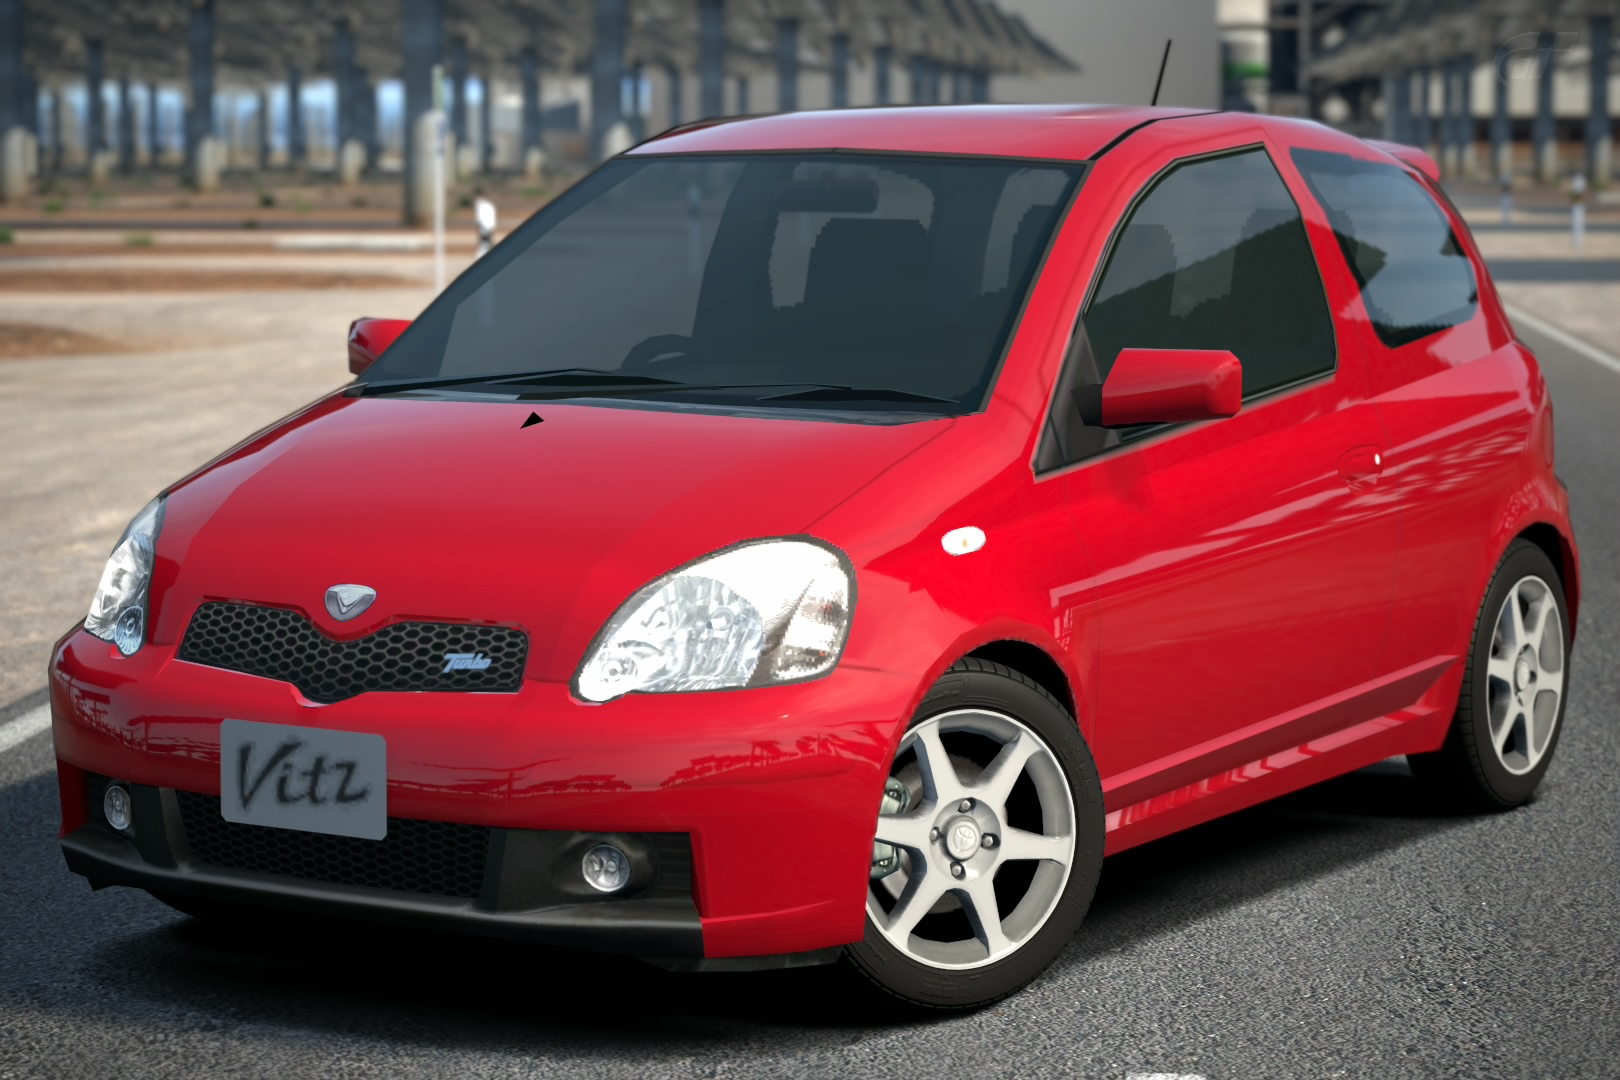 Kelebihan Toyota Yaris Rs Top Model Tahun Ini